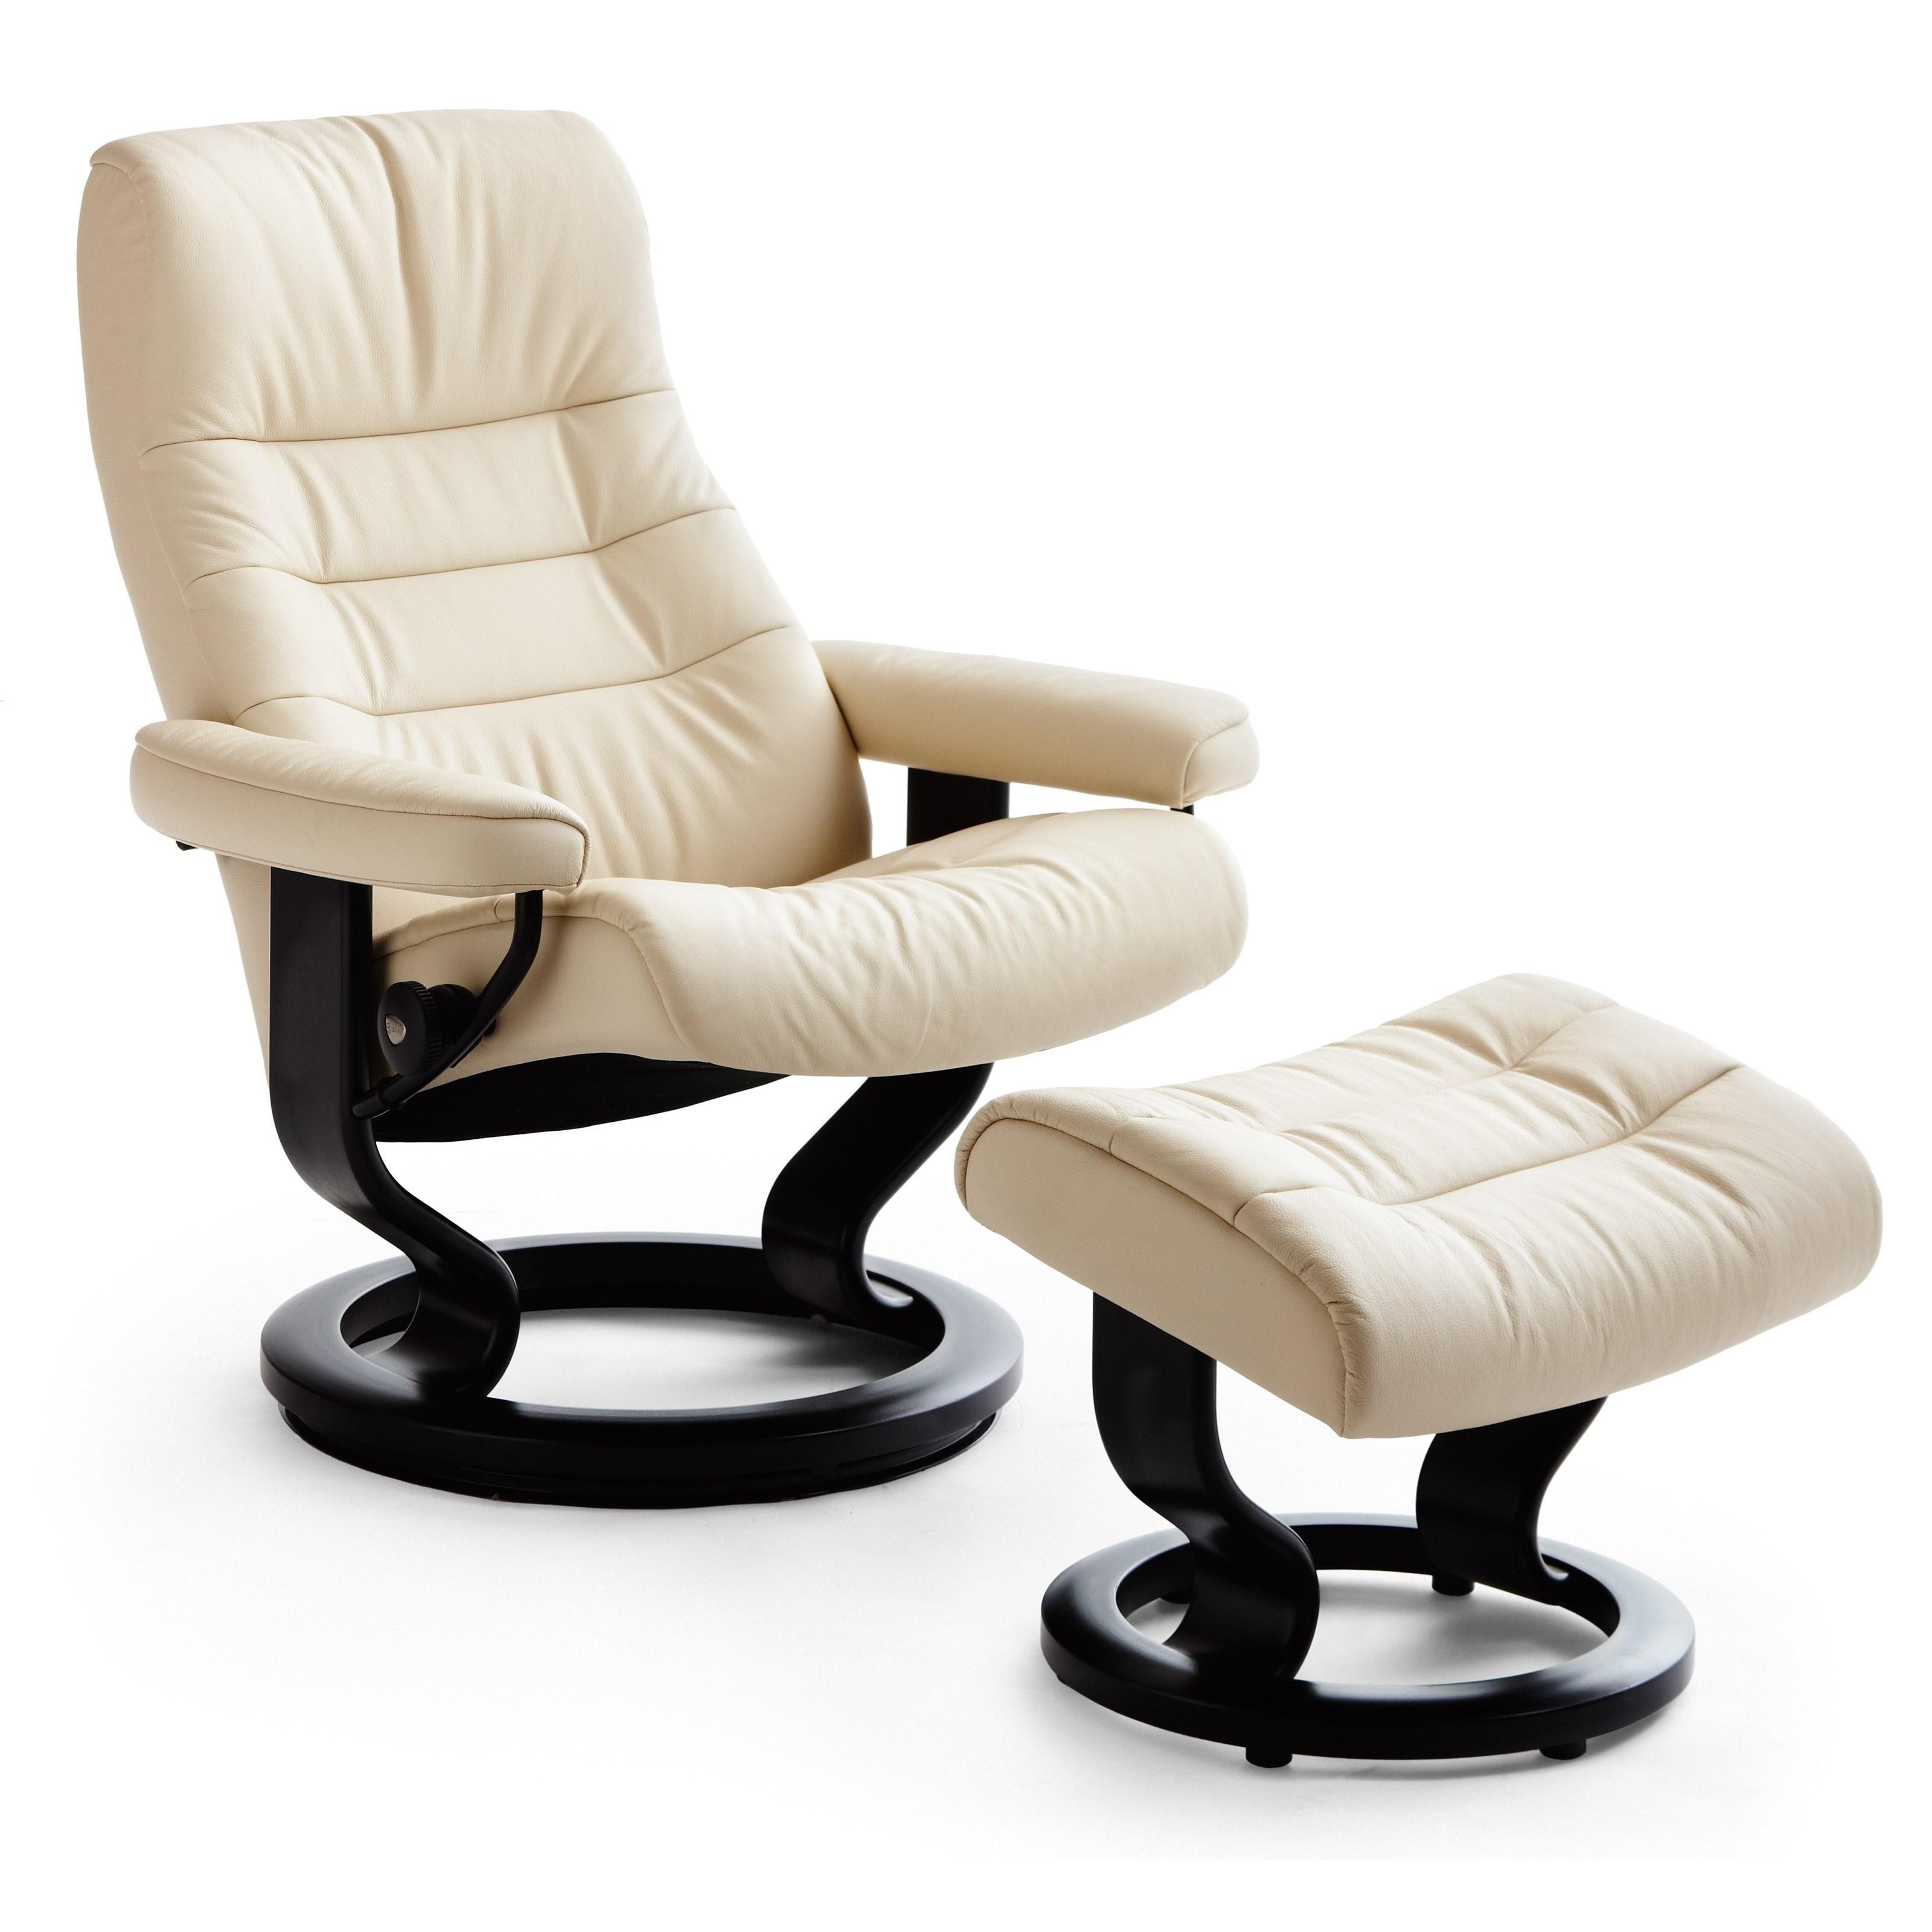 Opal Medium Opal Classic Chair by Stressless at Baer's Furniture